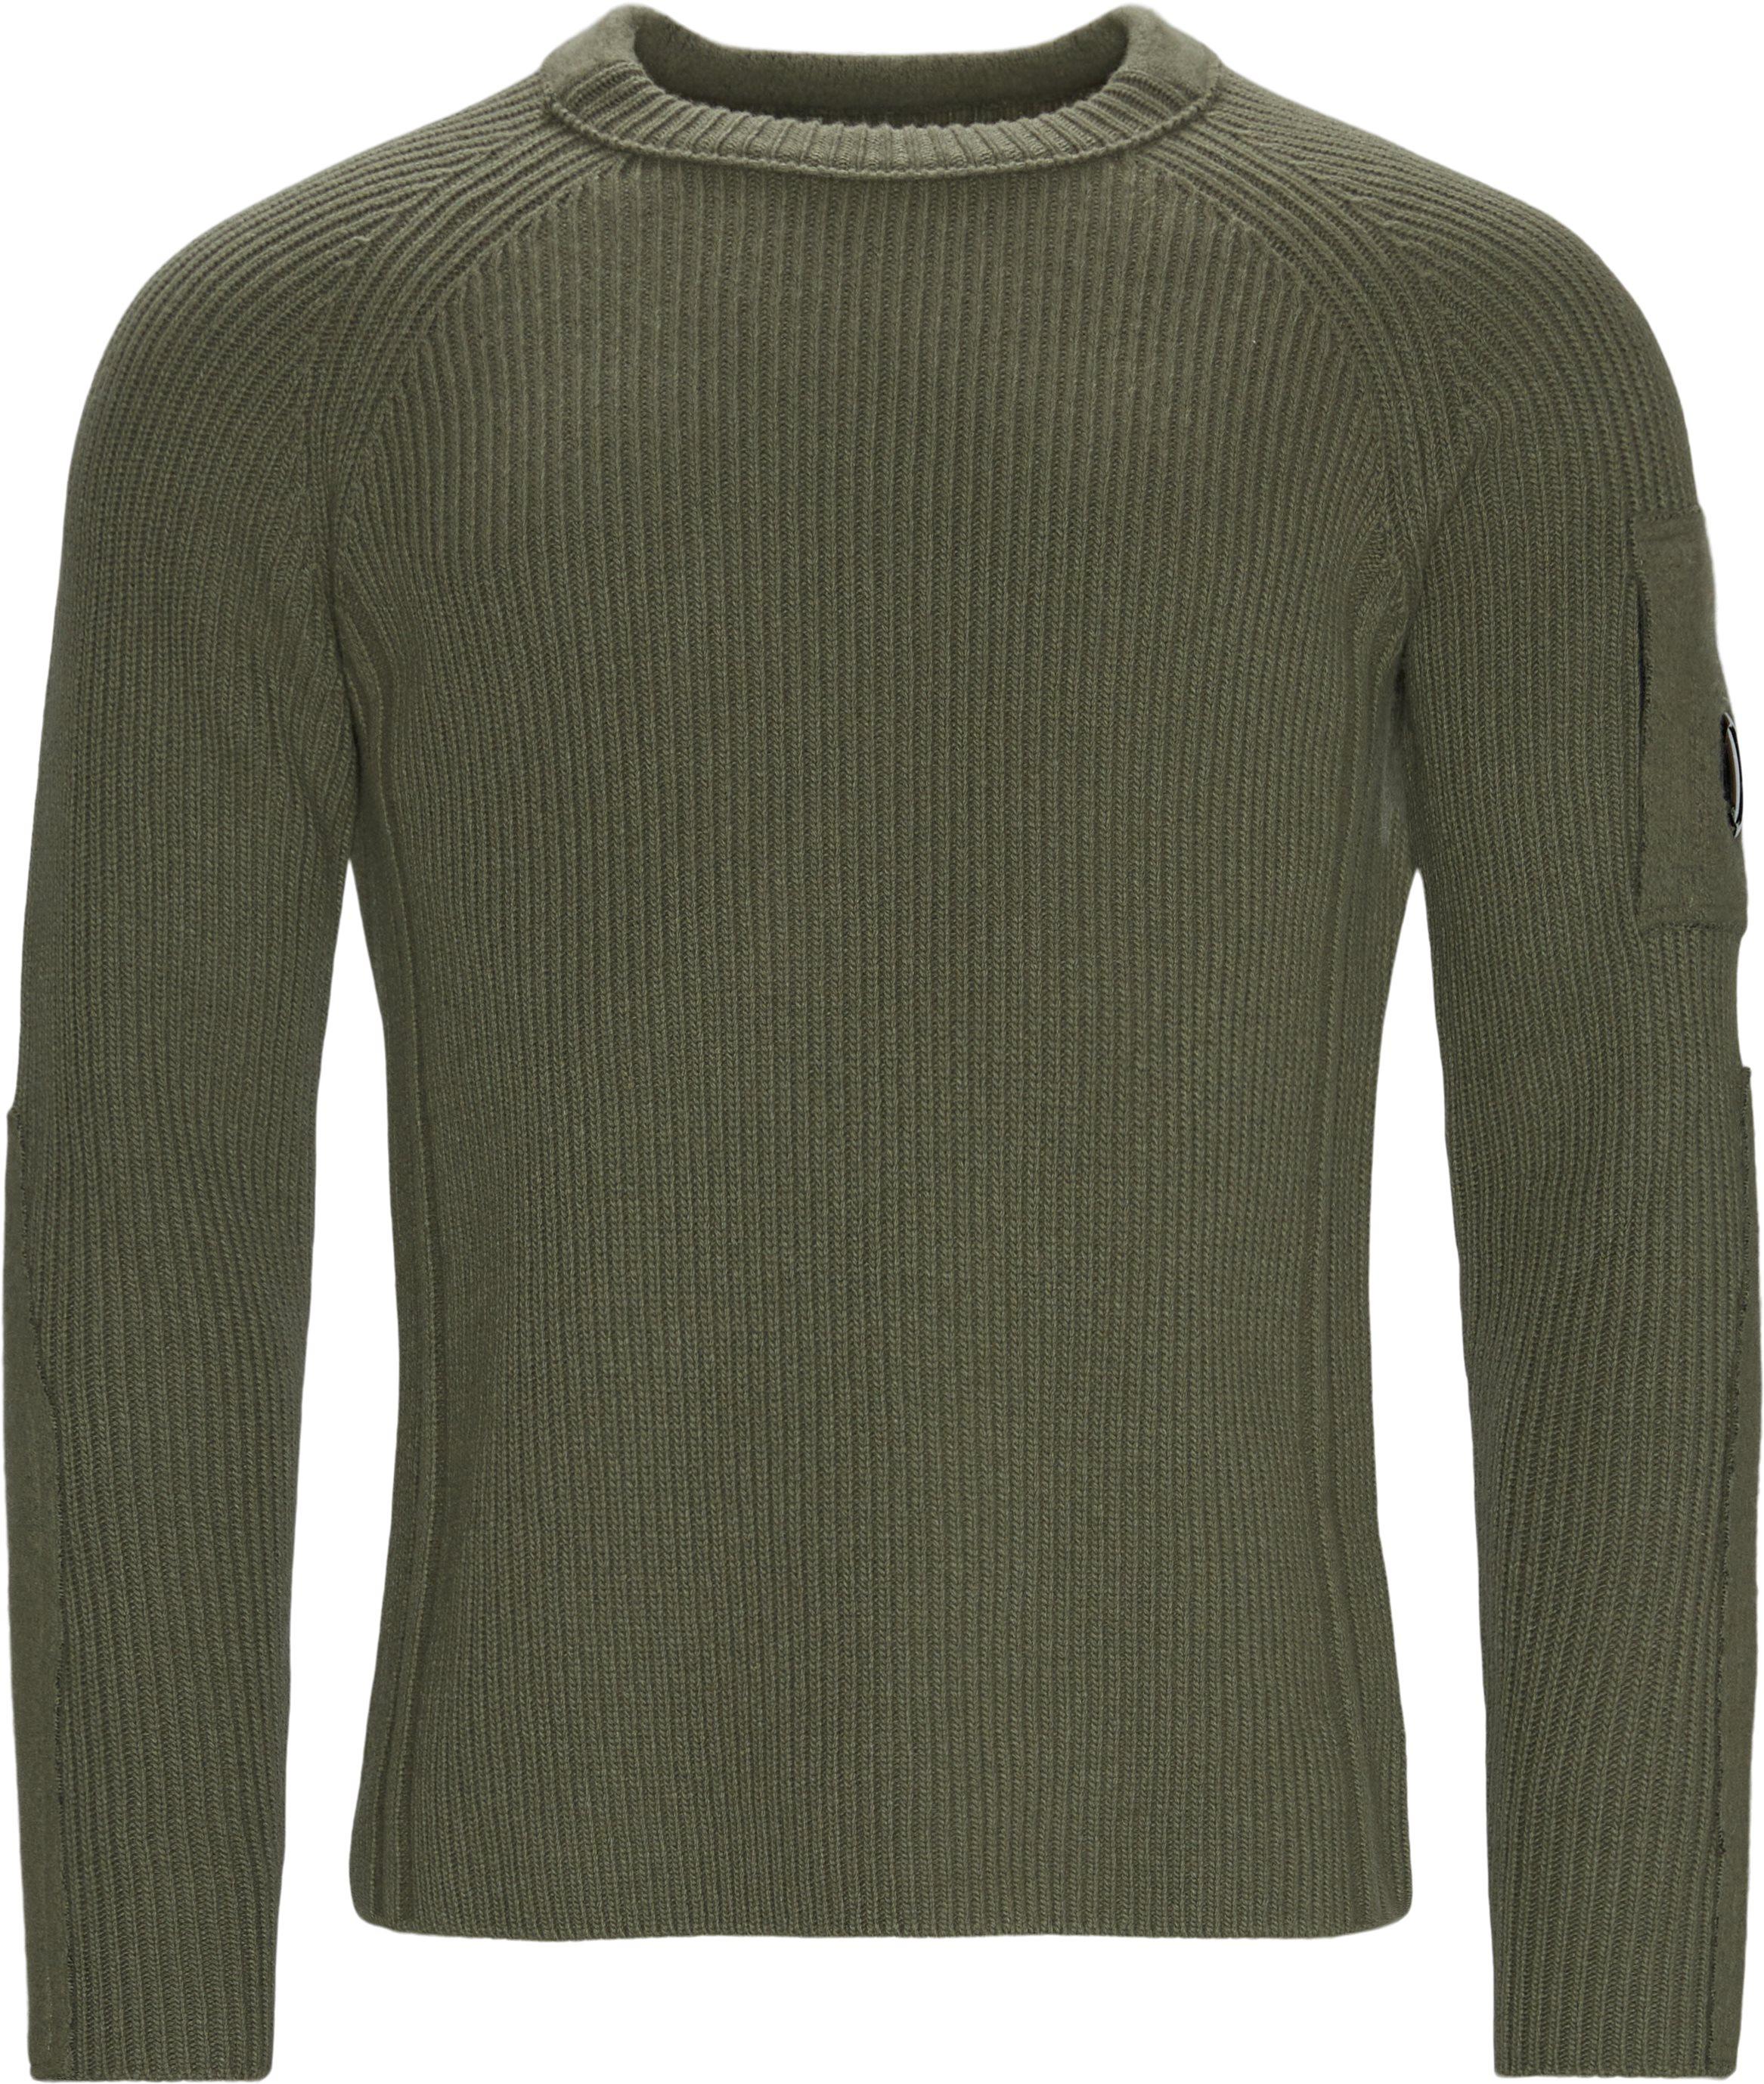 Knitted Sweatshirt - Strik - Regular fit - Army